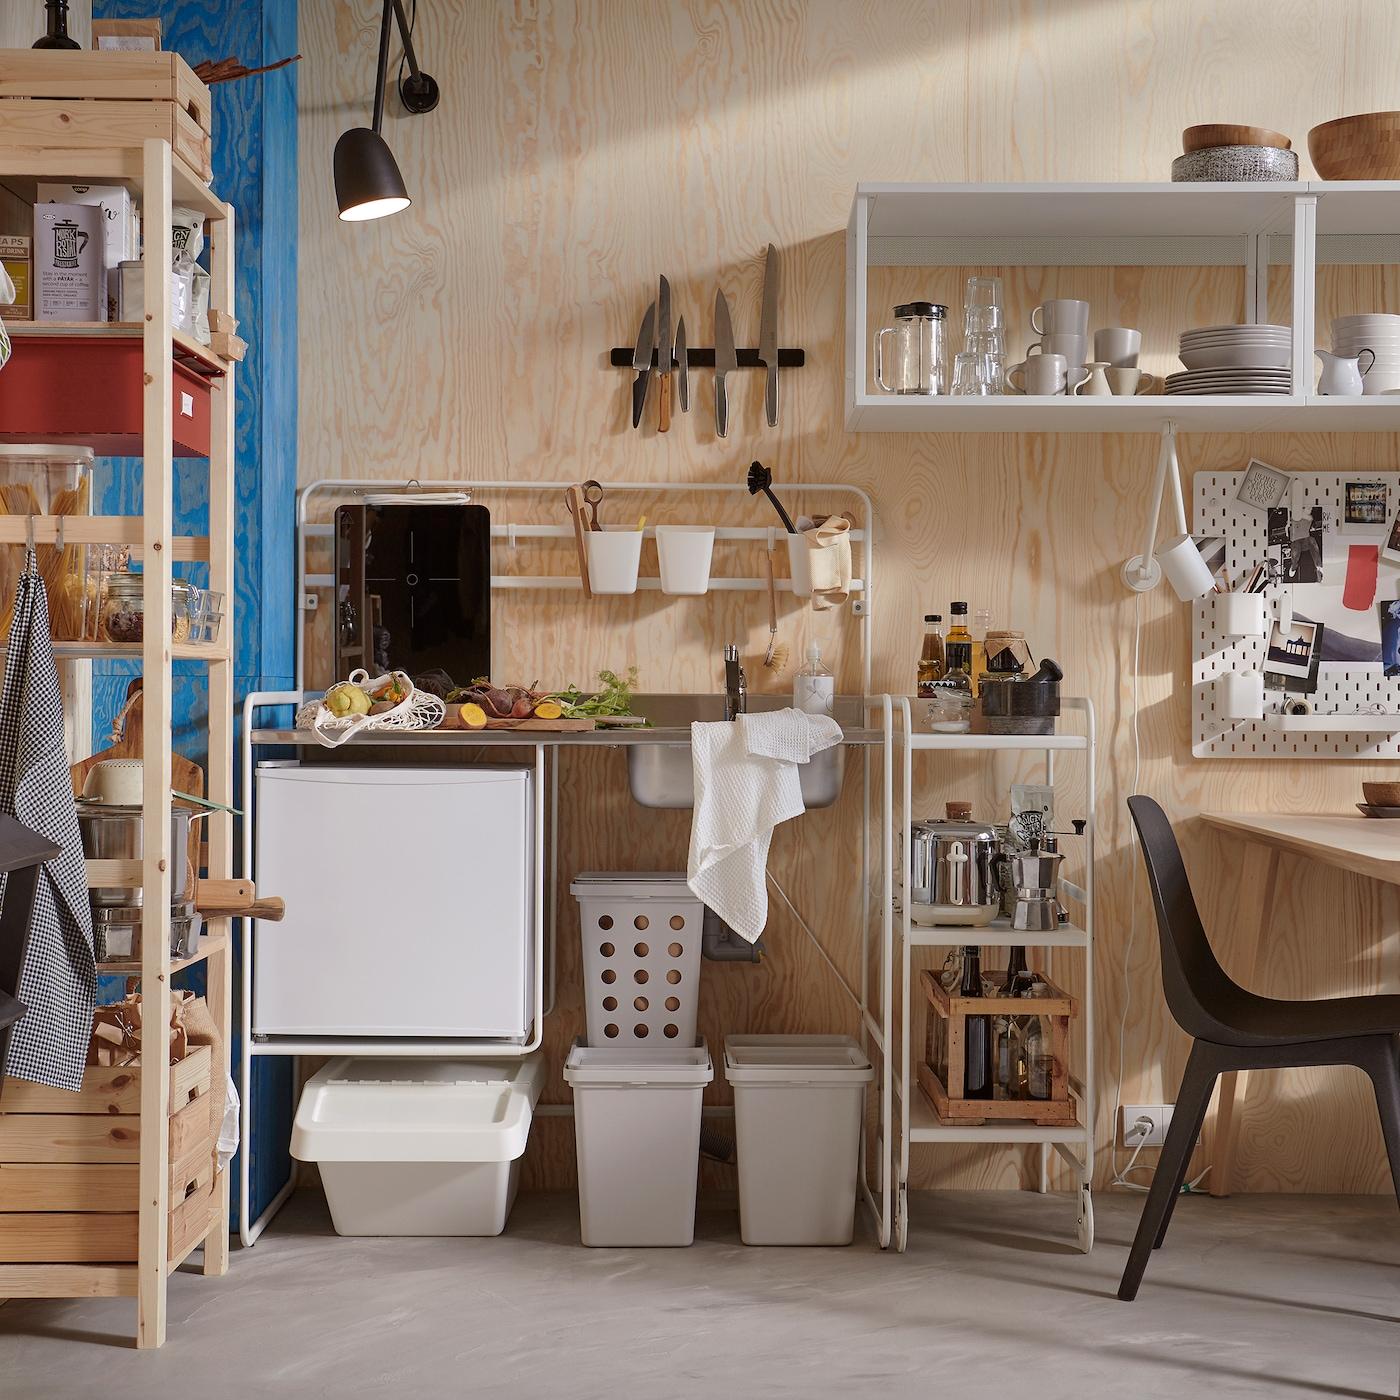 SUNNERSTA/スンネルスタ ミニキッチン、グレーの分別ゴミ箱、パイン材の収納システム、ブラックのチェアを配置した、明るい小型キッチン。